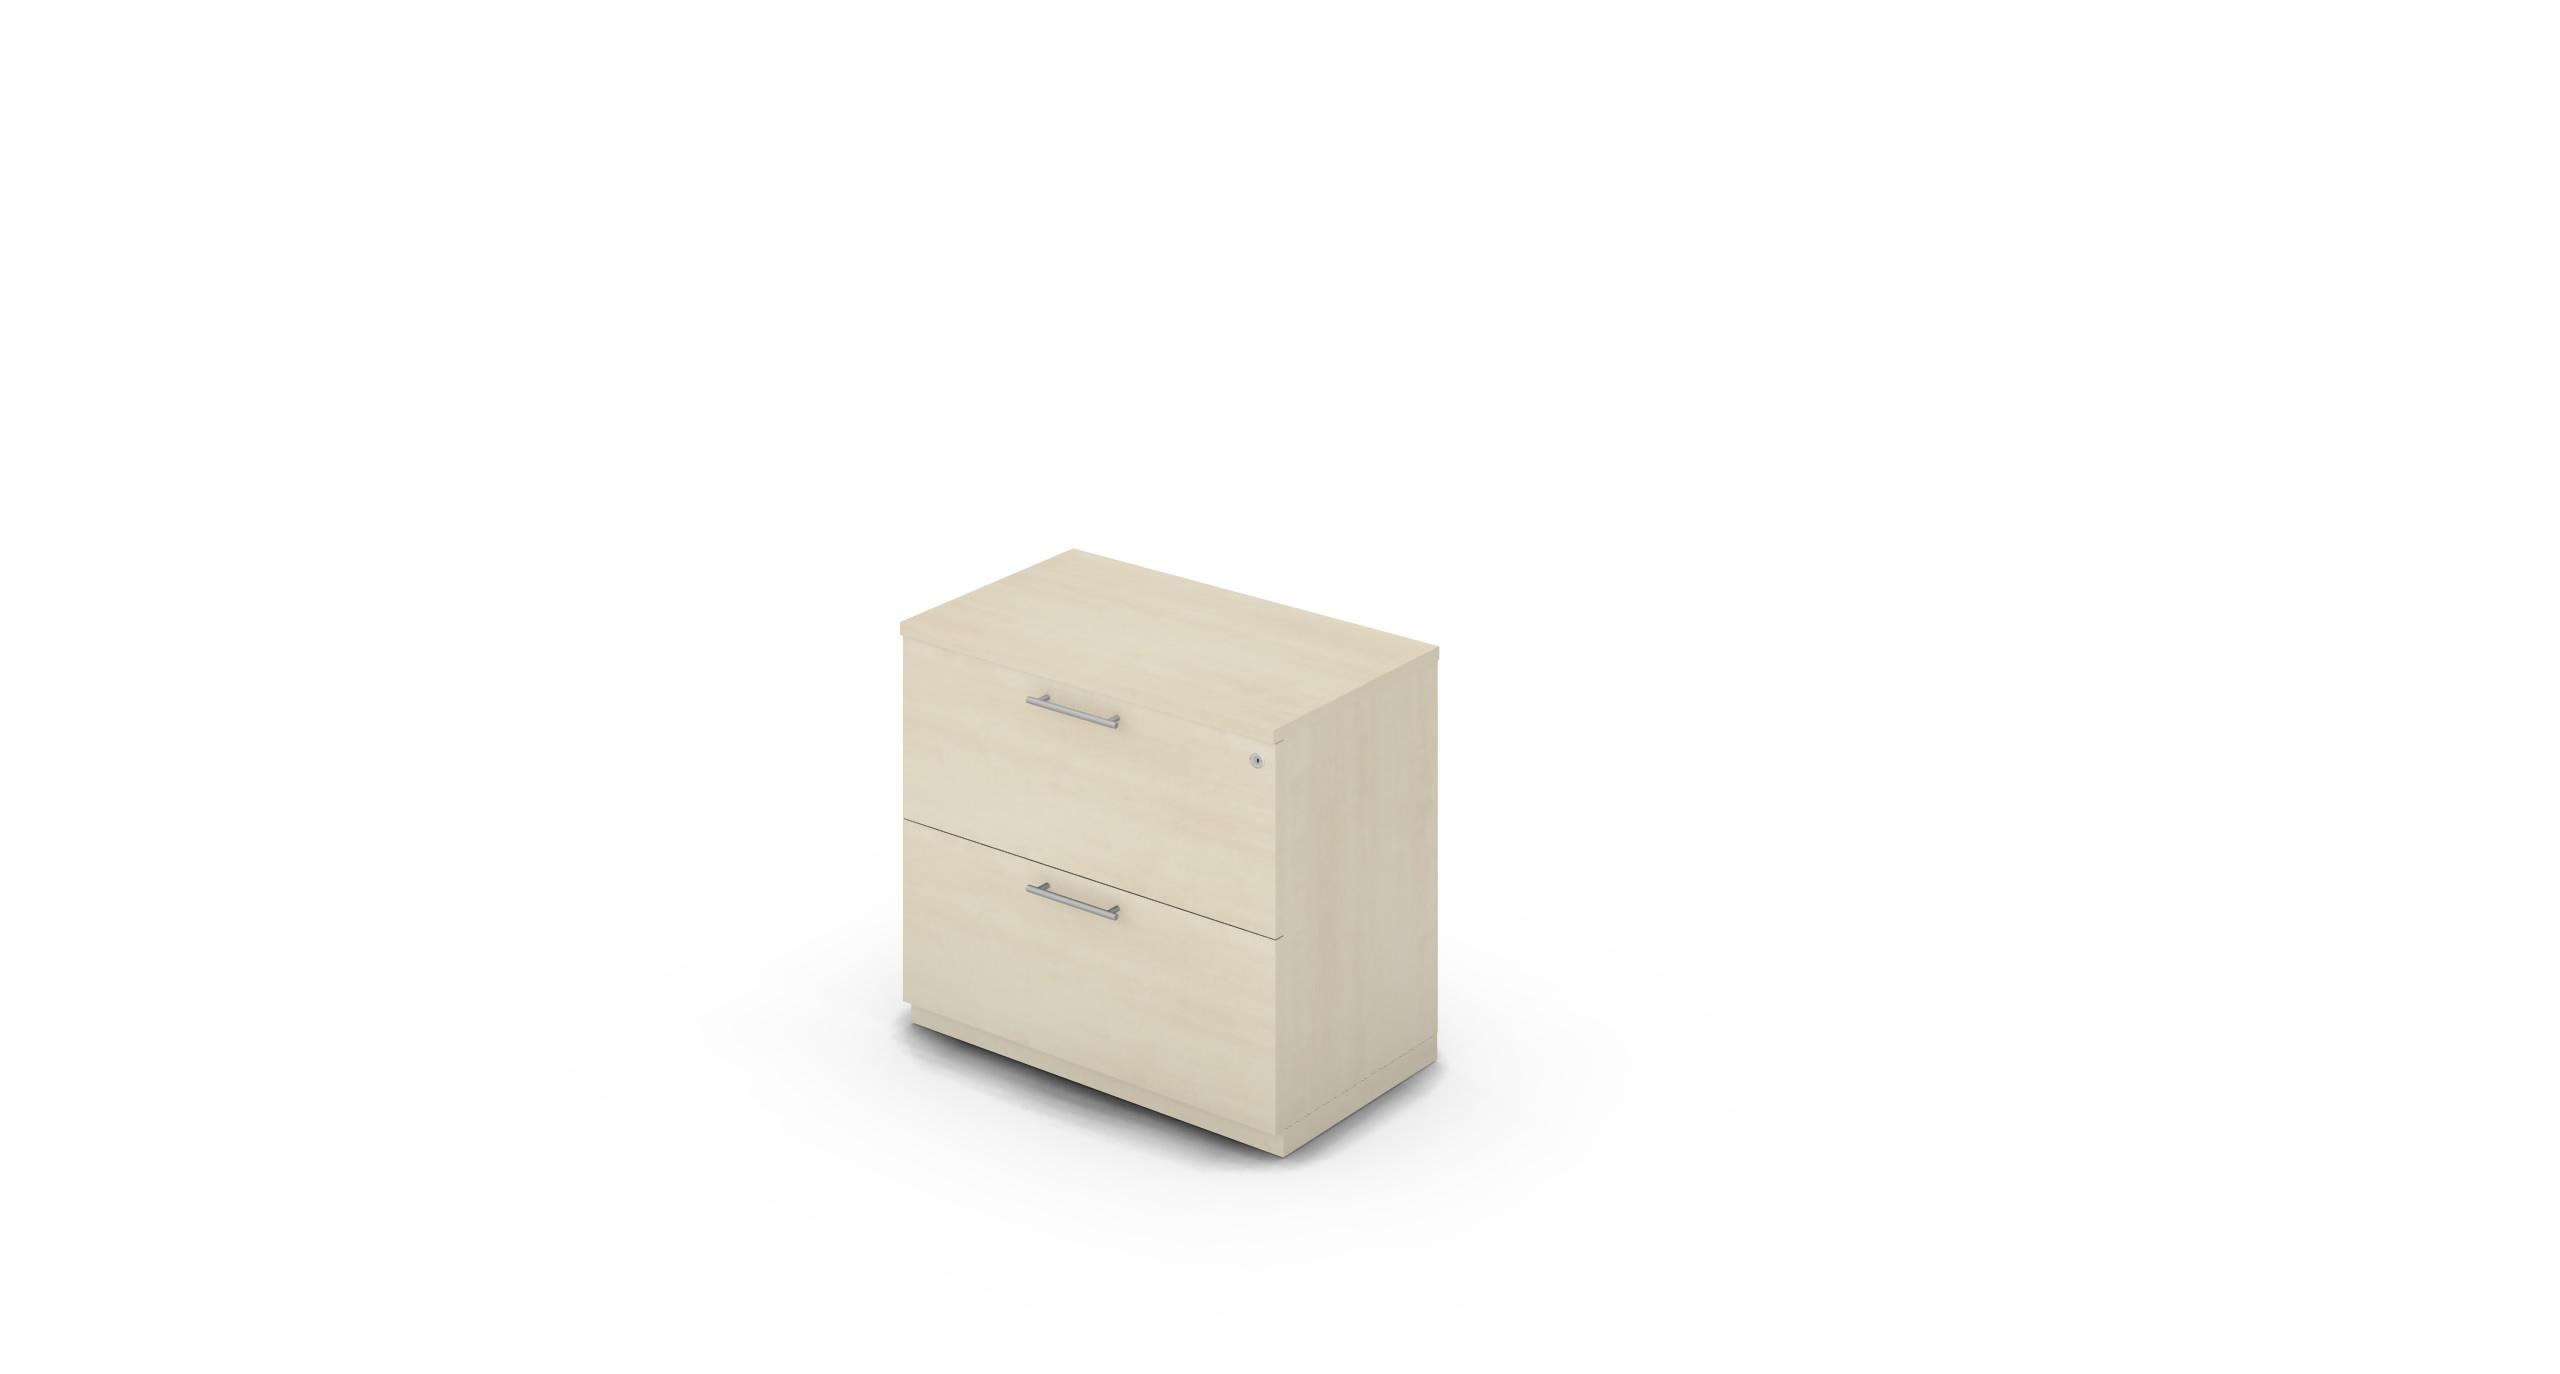 Cabinet_800x450x775_DR_Maple_Bar_Round_WithCylinder